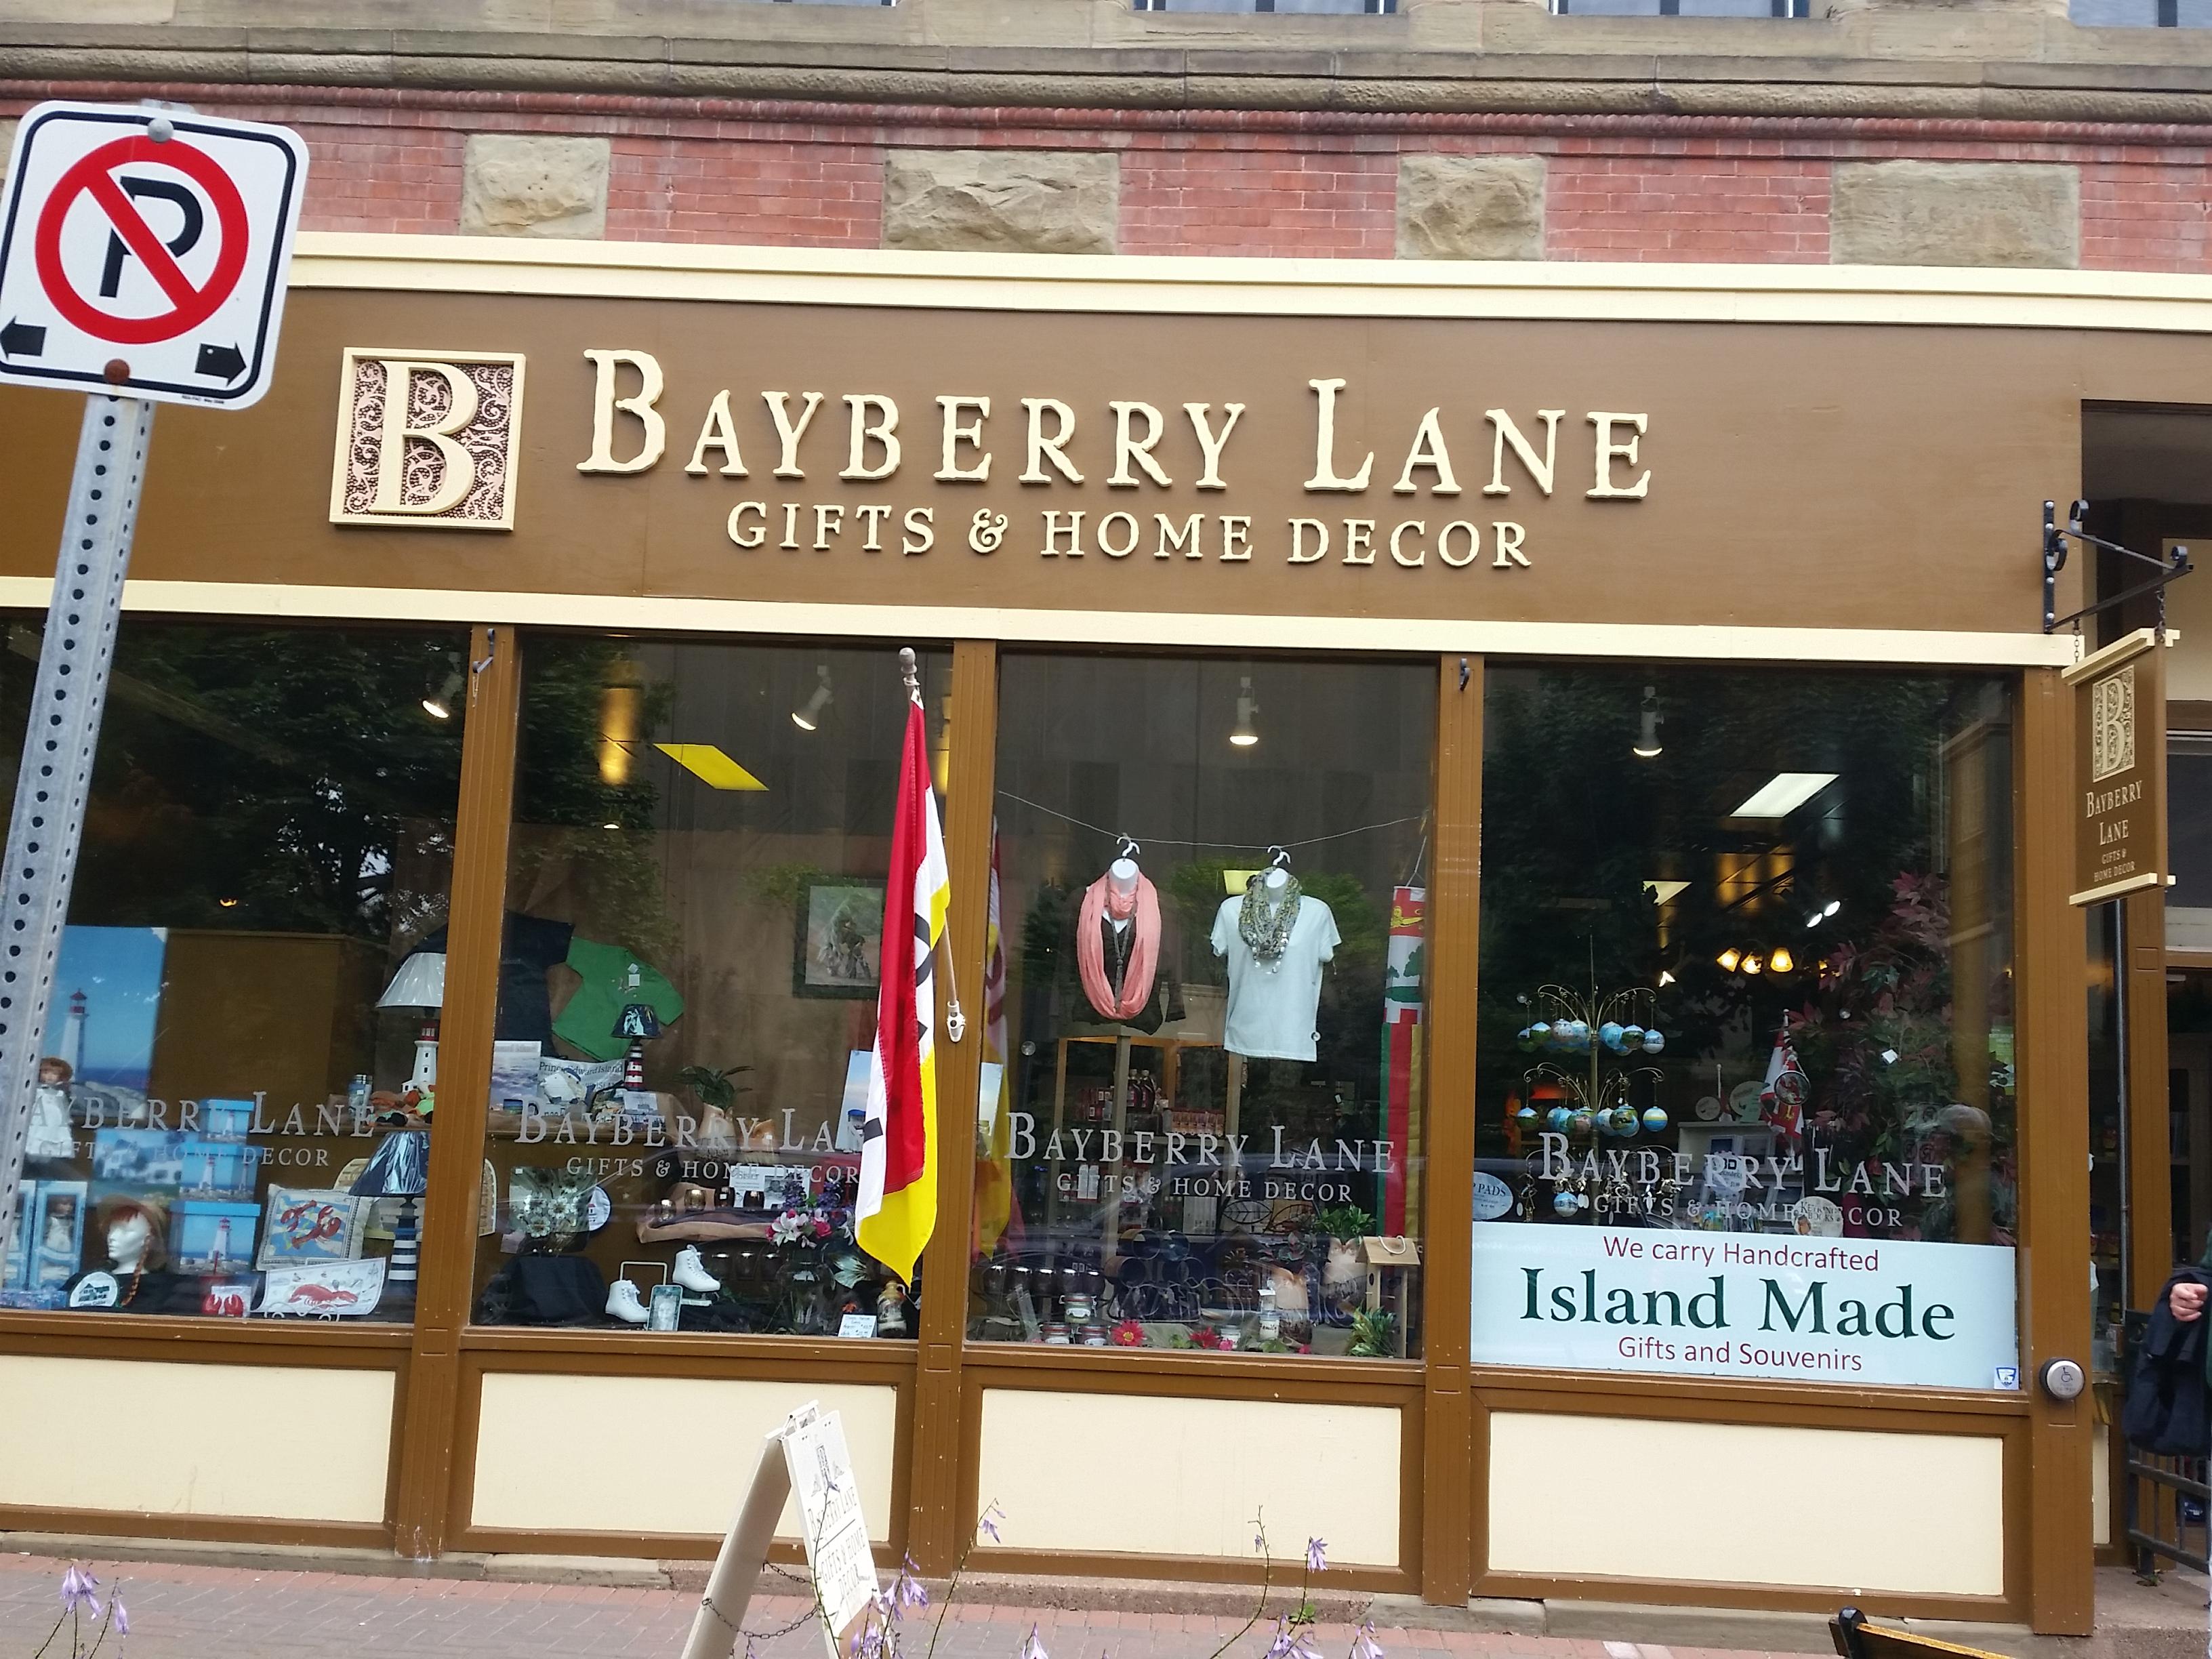 Bayberry Lane